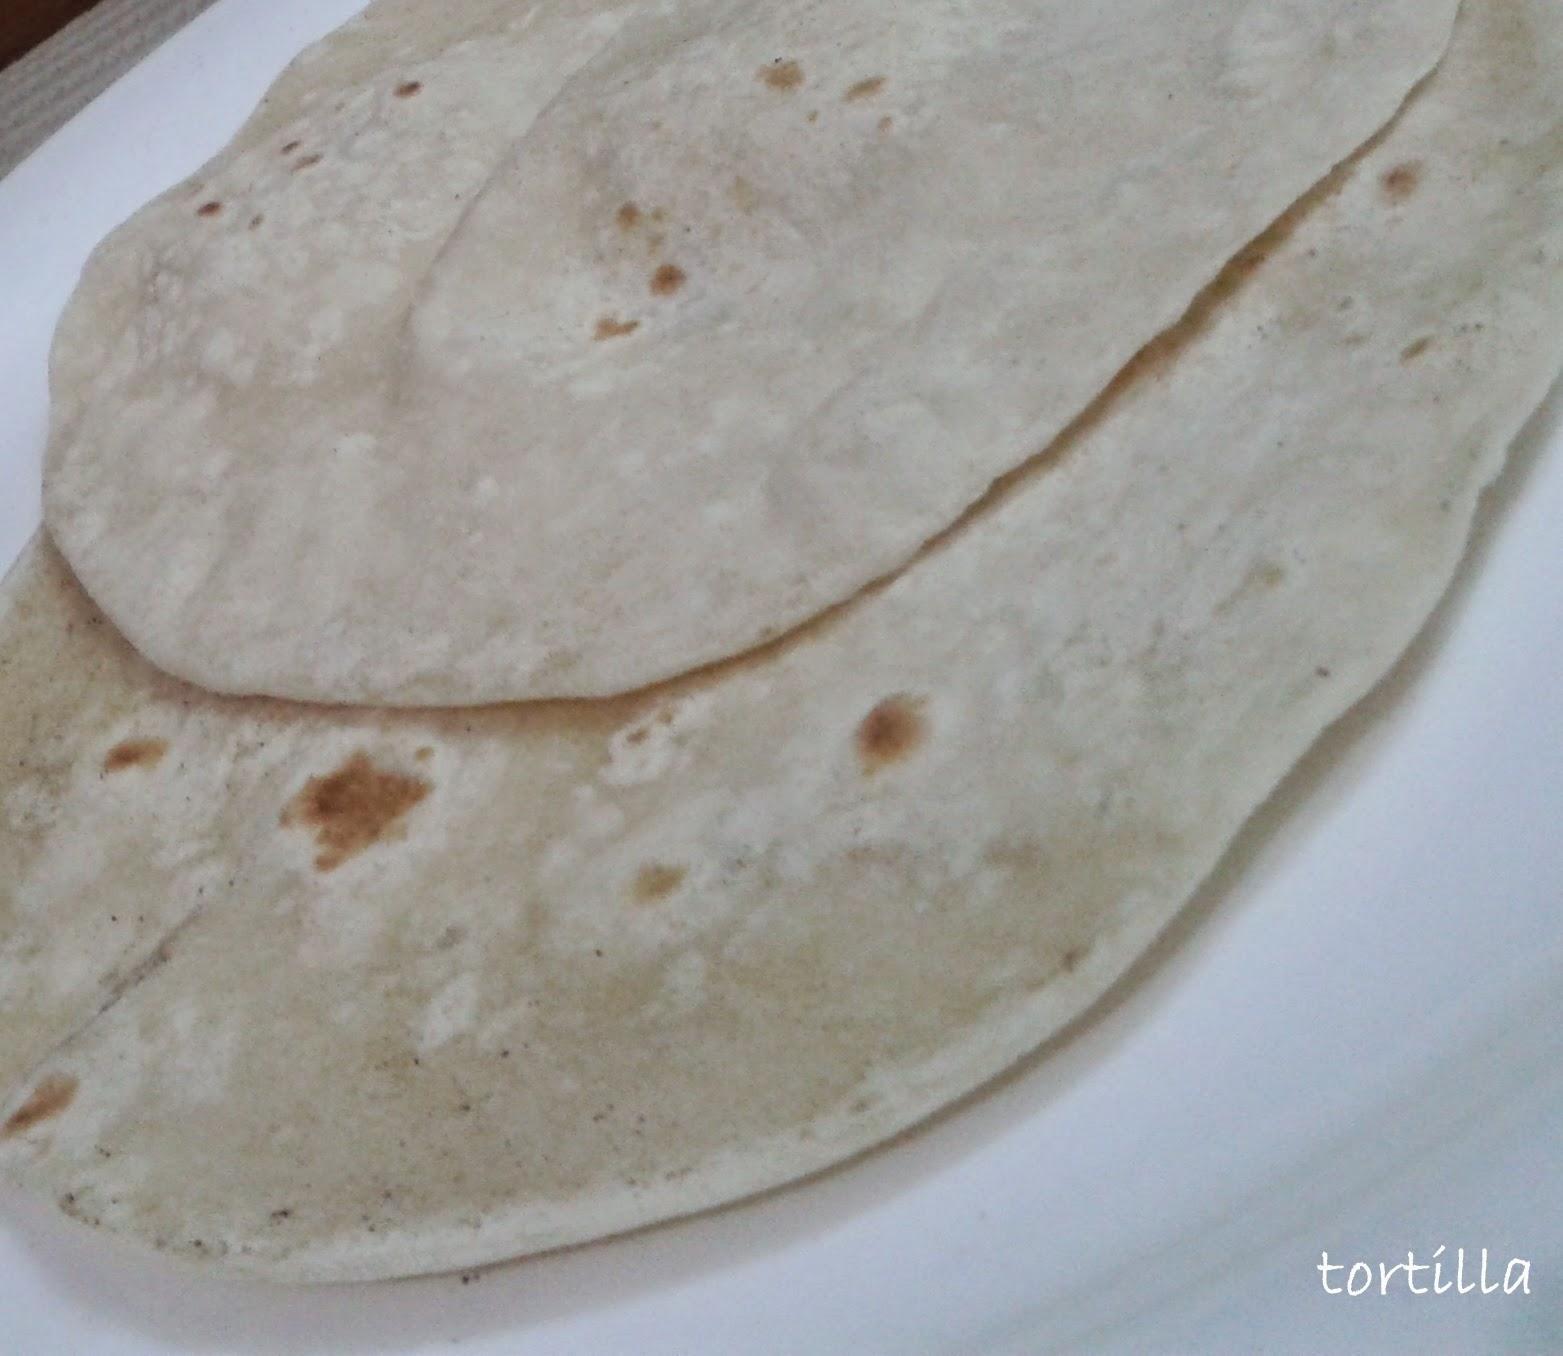 http://www.paakvidhi.com/2014/11/tortilla.html